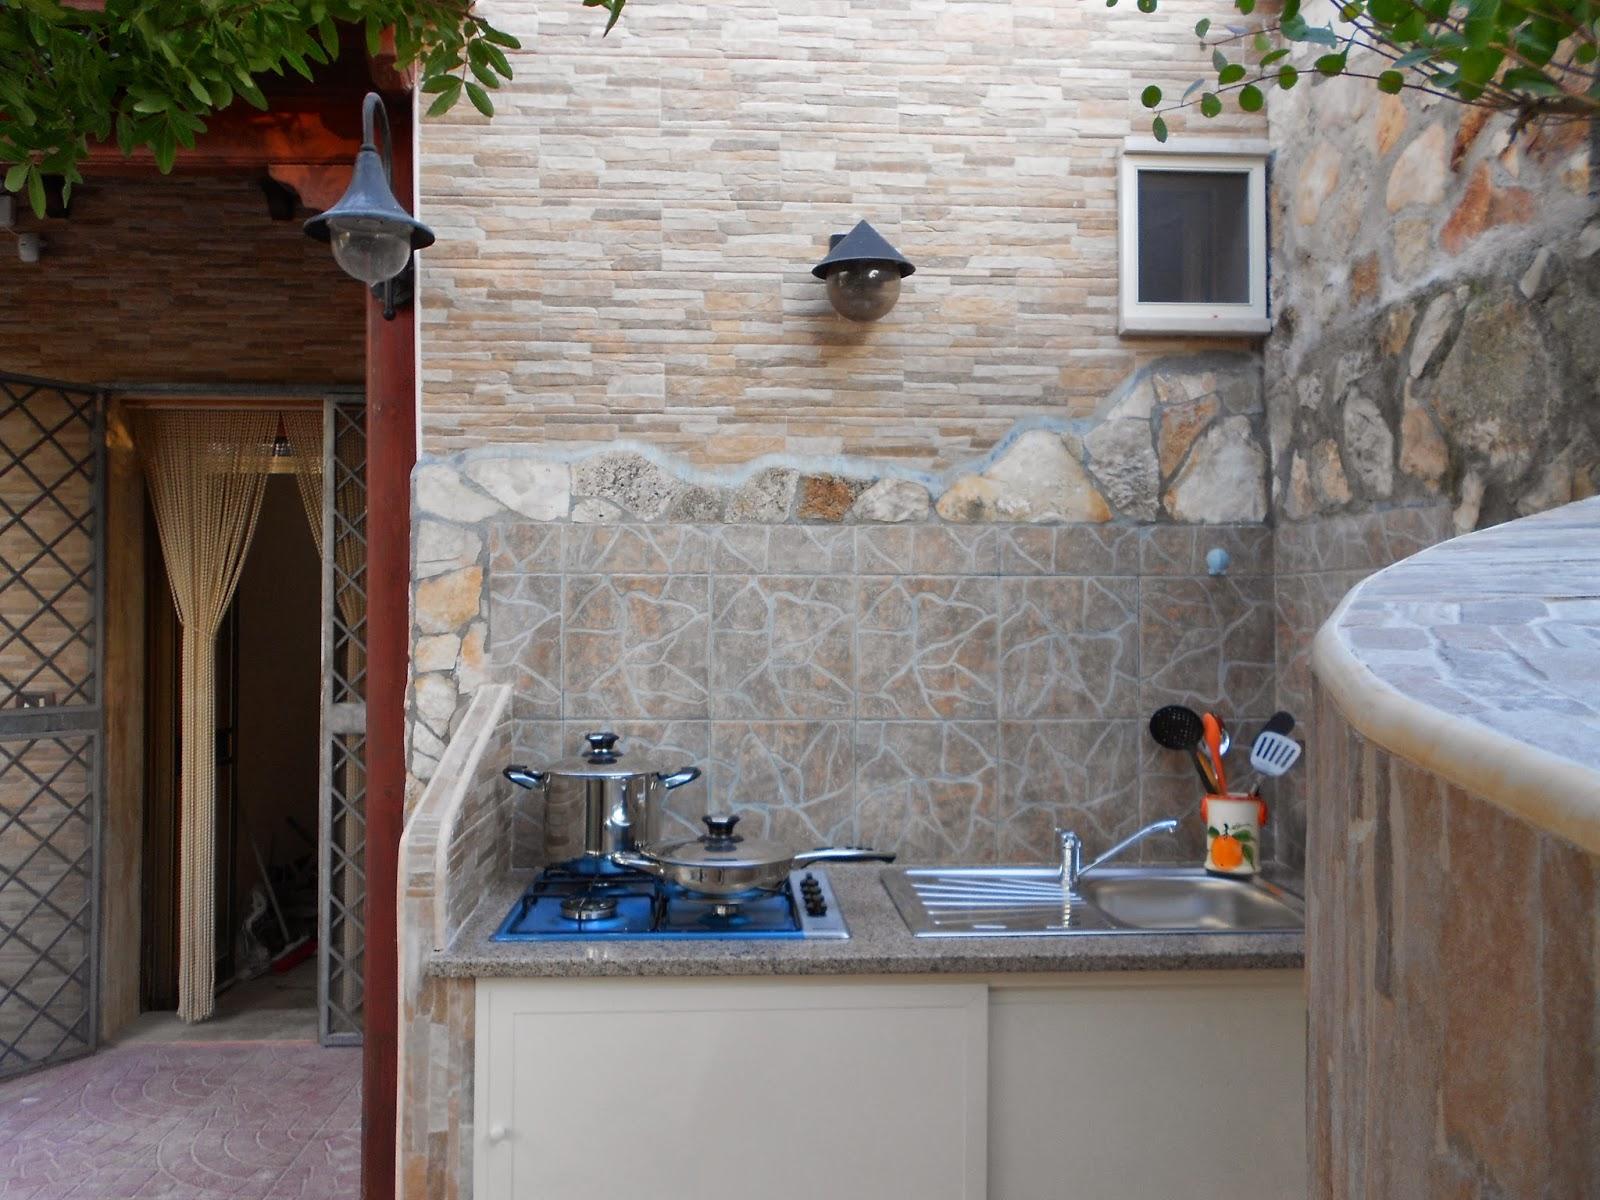 Tavolo tondo cucina - Cabina doccia esterna ...